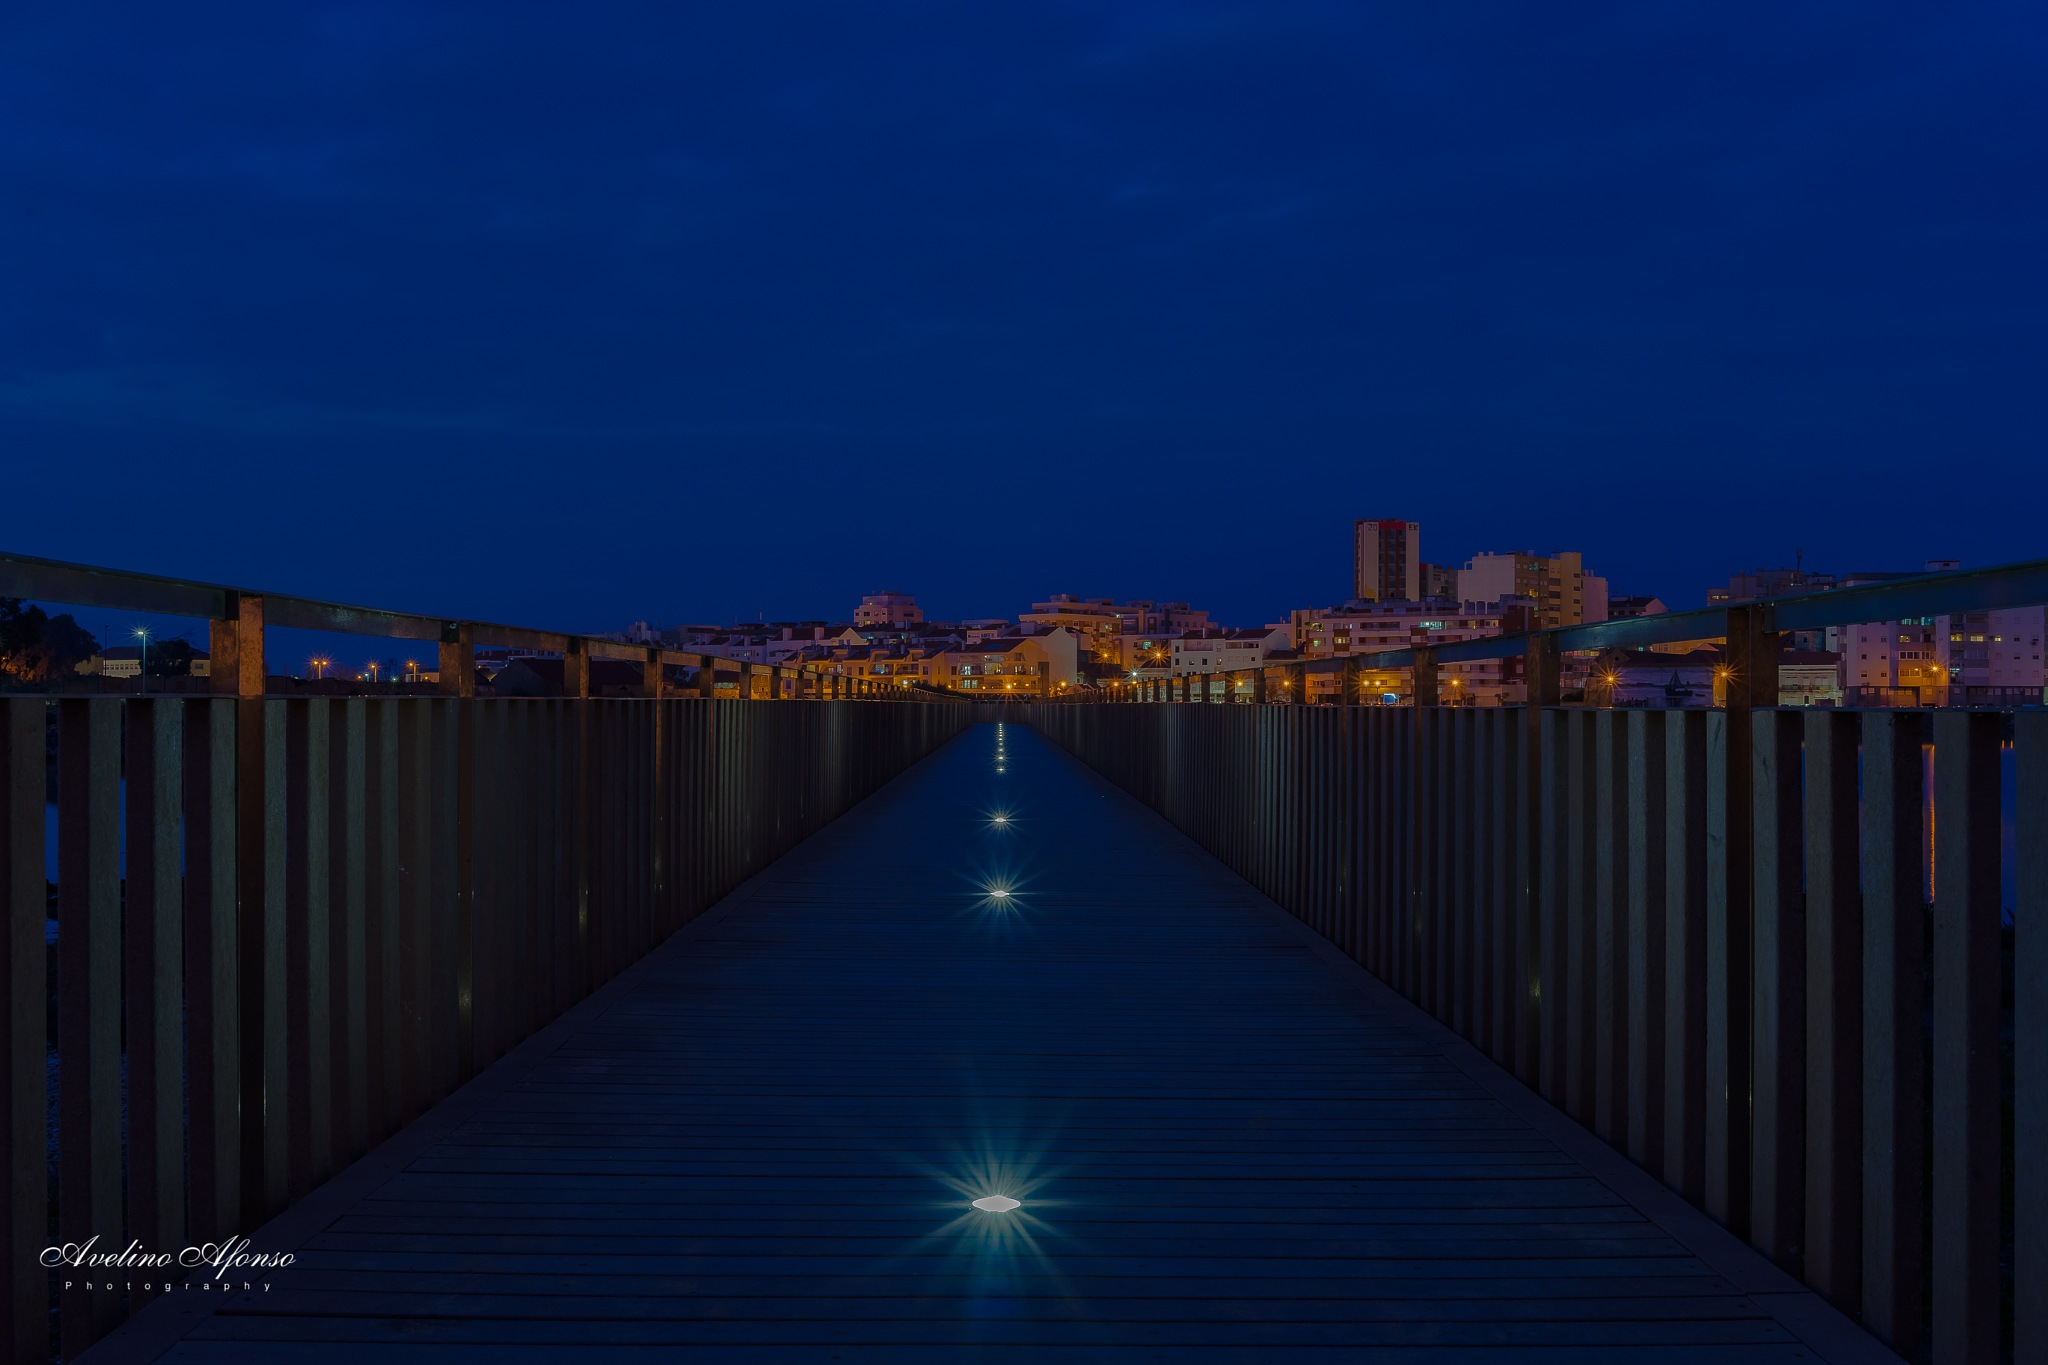 Passadiço by night by Avelino Afonso